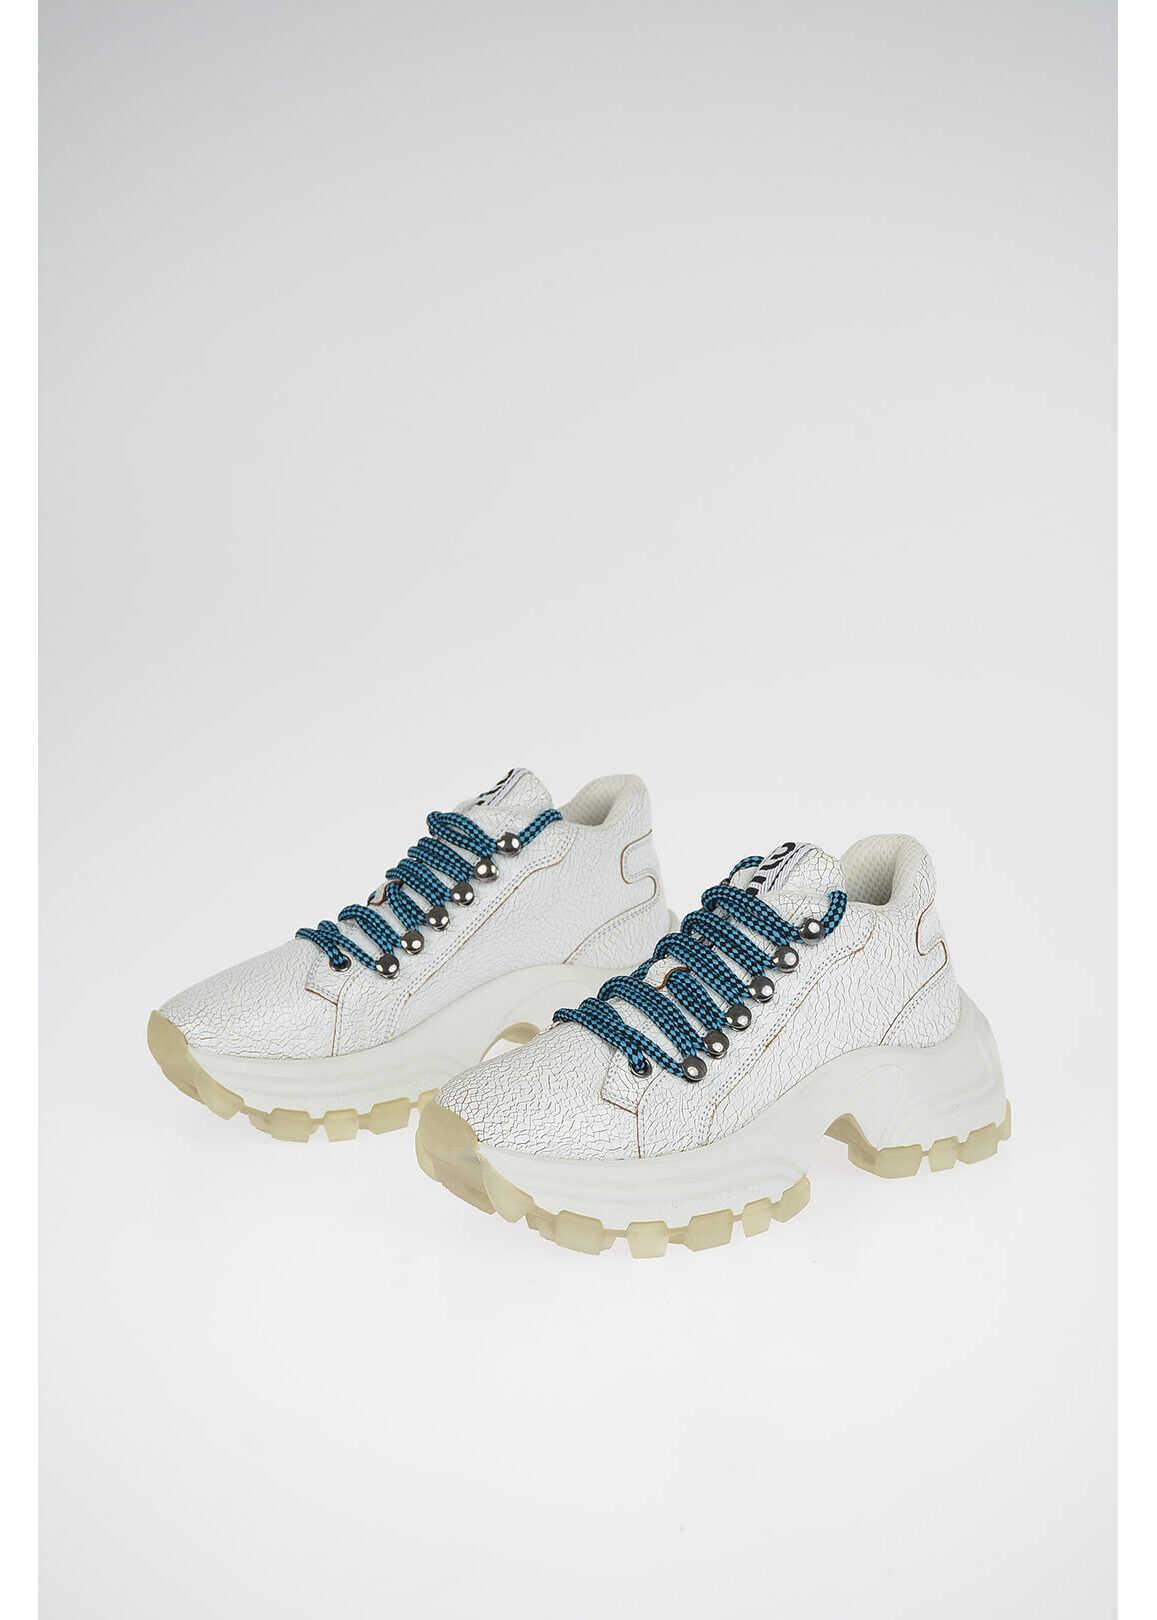 Miu Miu Cracked Leather Track Sneakers WHITE imagine b-mall.ro